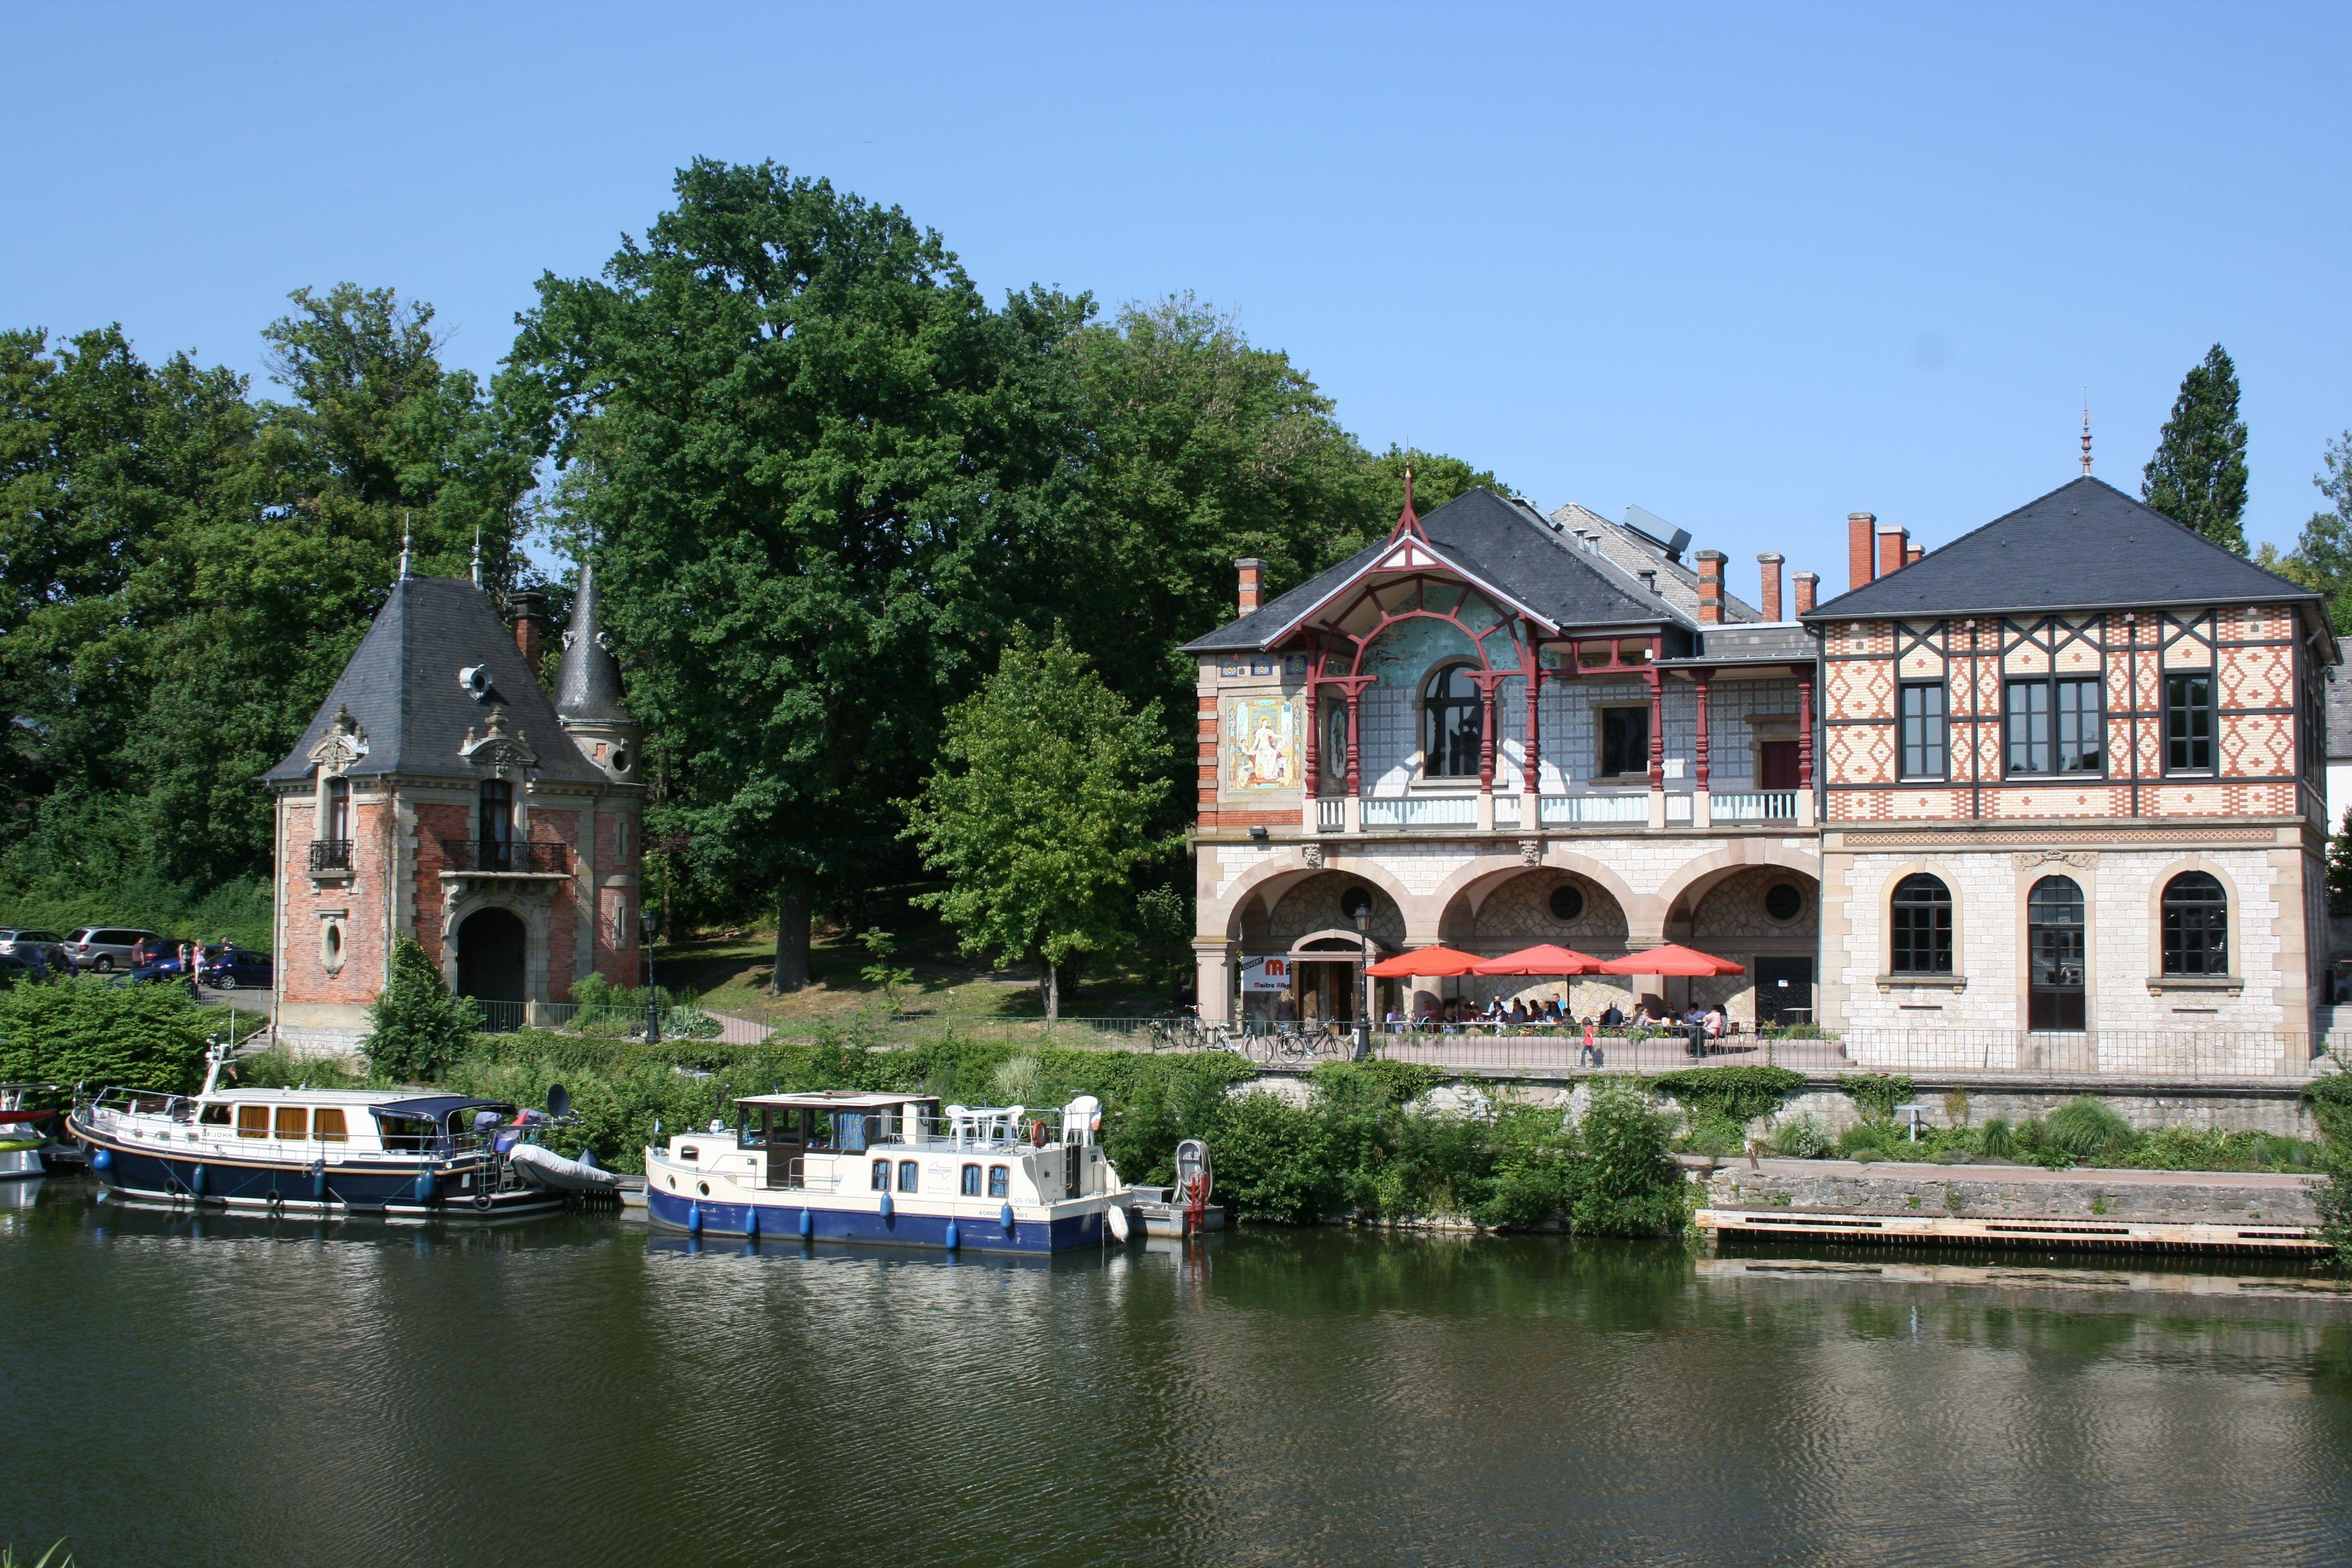 Sarraguemines Moselle dept Lorraine region, France